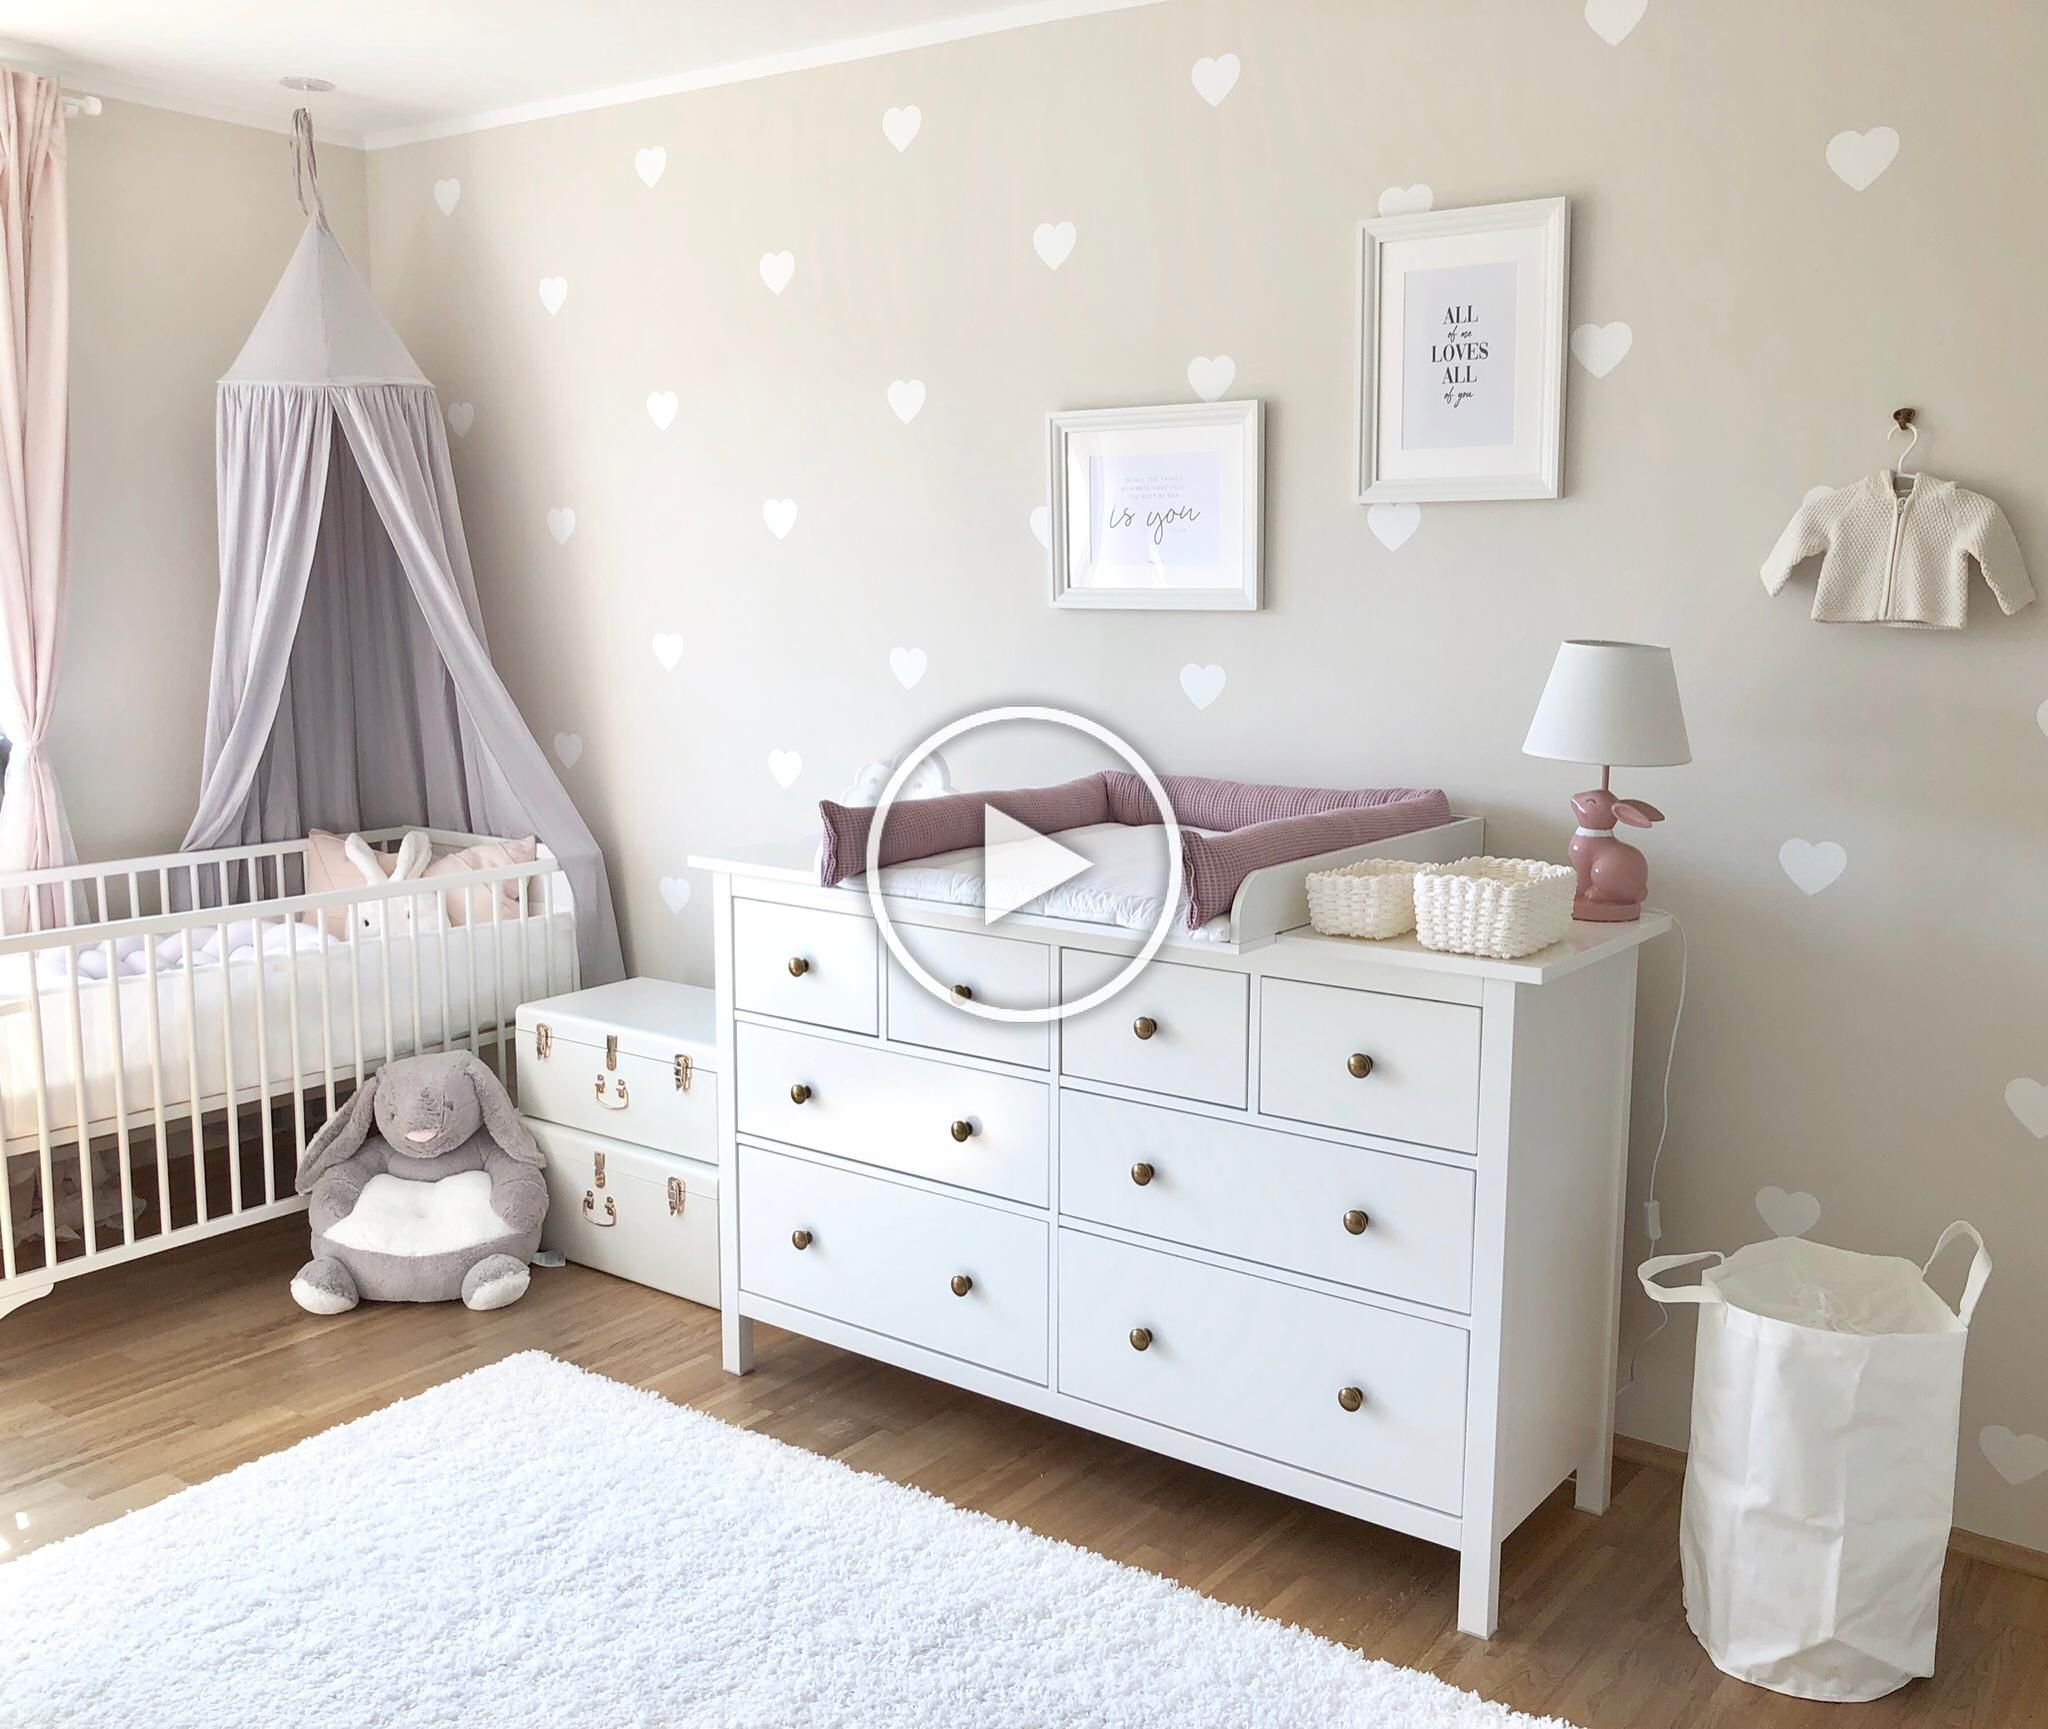 Babyzimmer Dekoration Babyroom Kinderzimmer Madchenzimmer